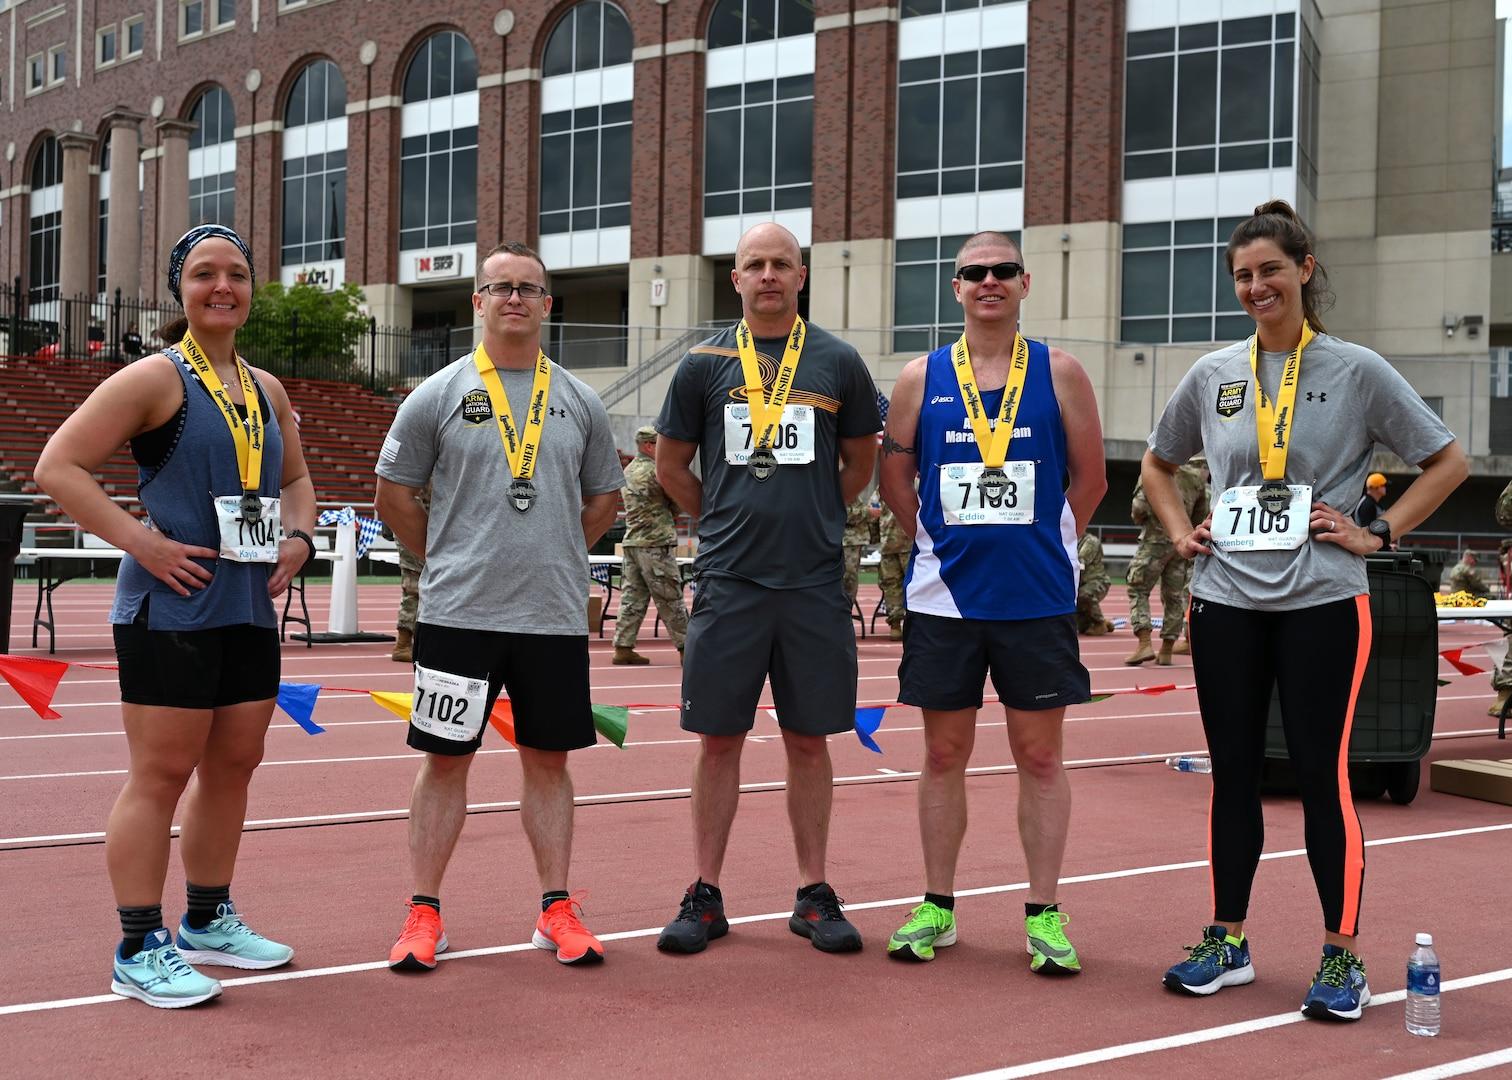 The 2021 New Hampshire National Guard Marathon Team poses at University of Nebraska's Ed Weir Stadium following their May 2, 2021, Lincoln Marathon finish.